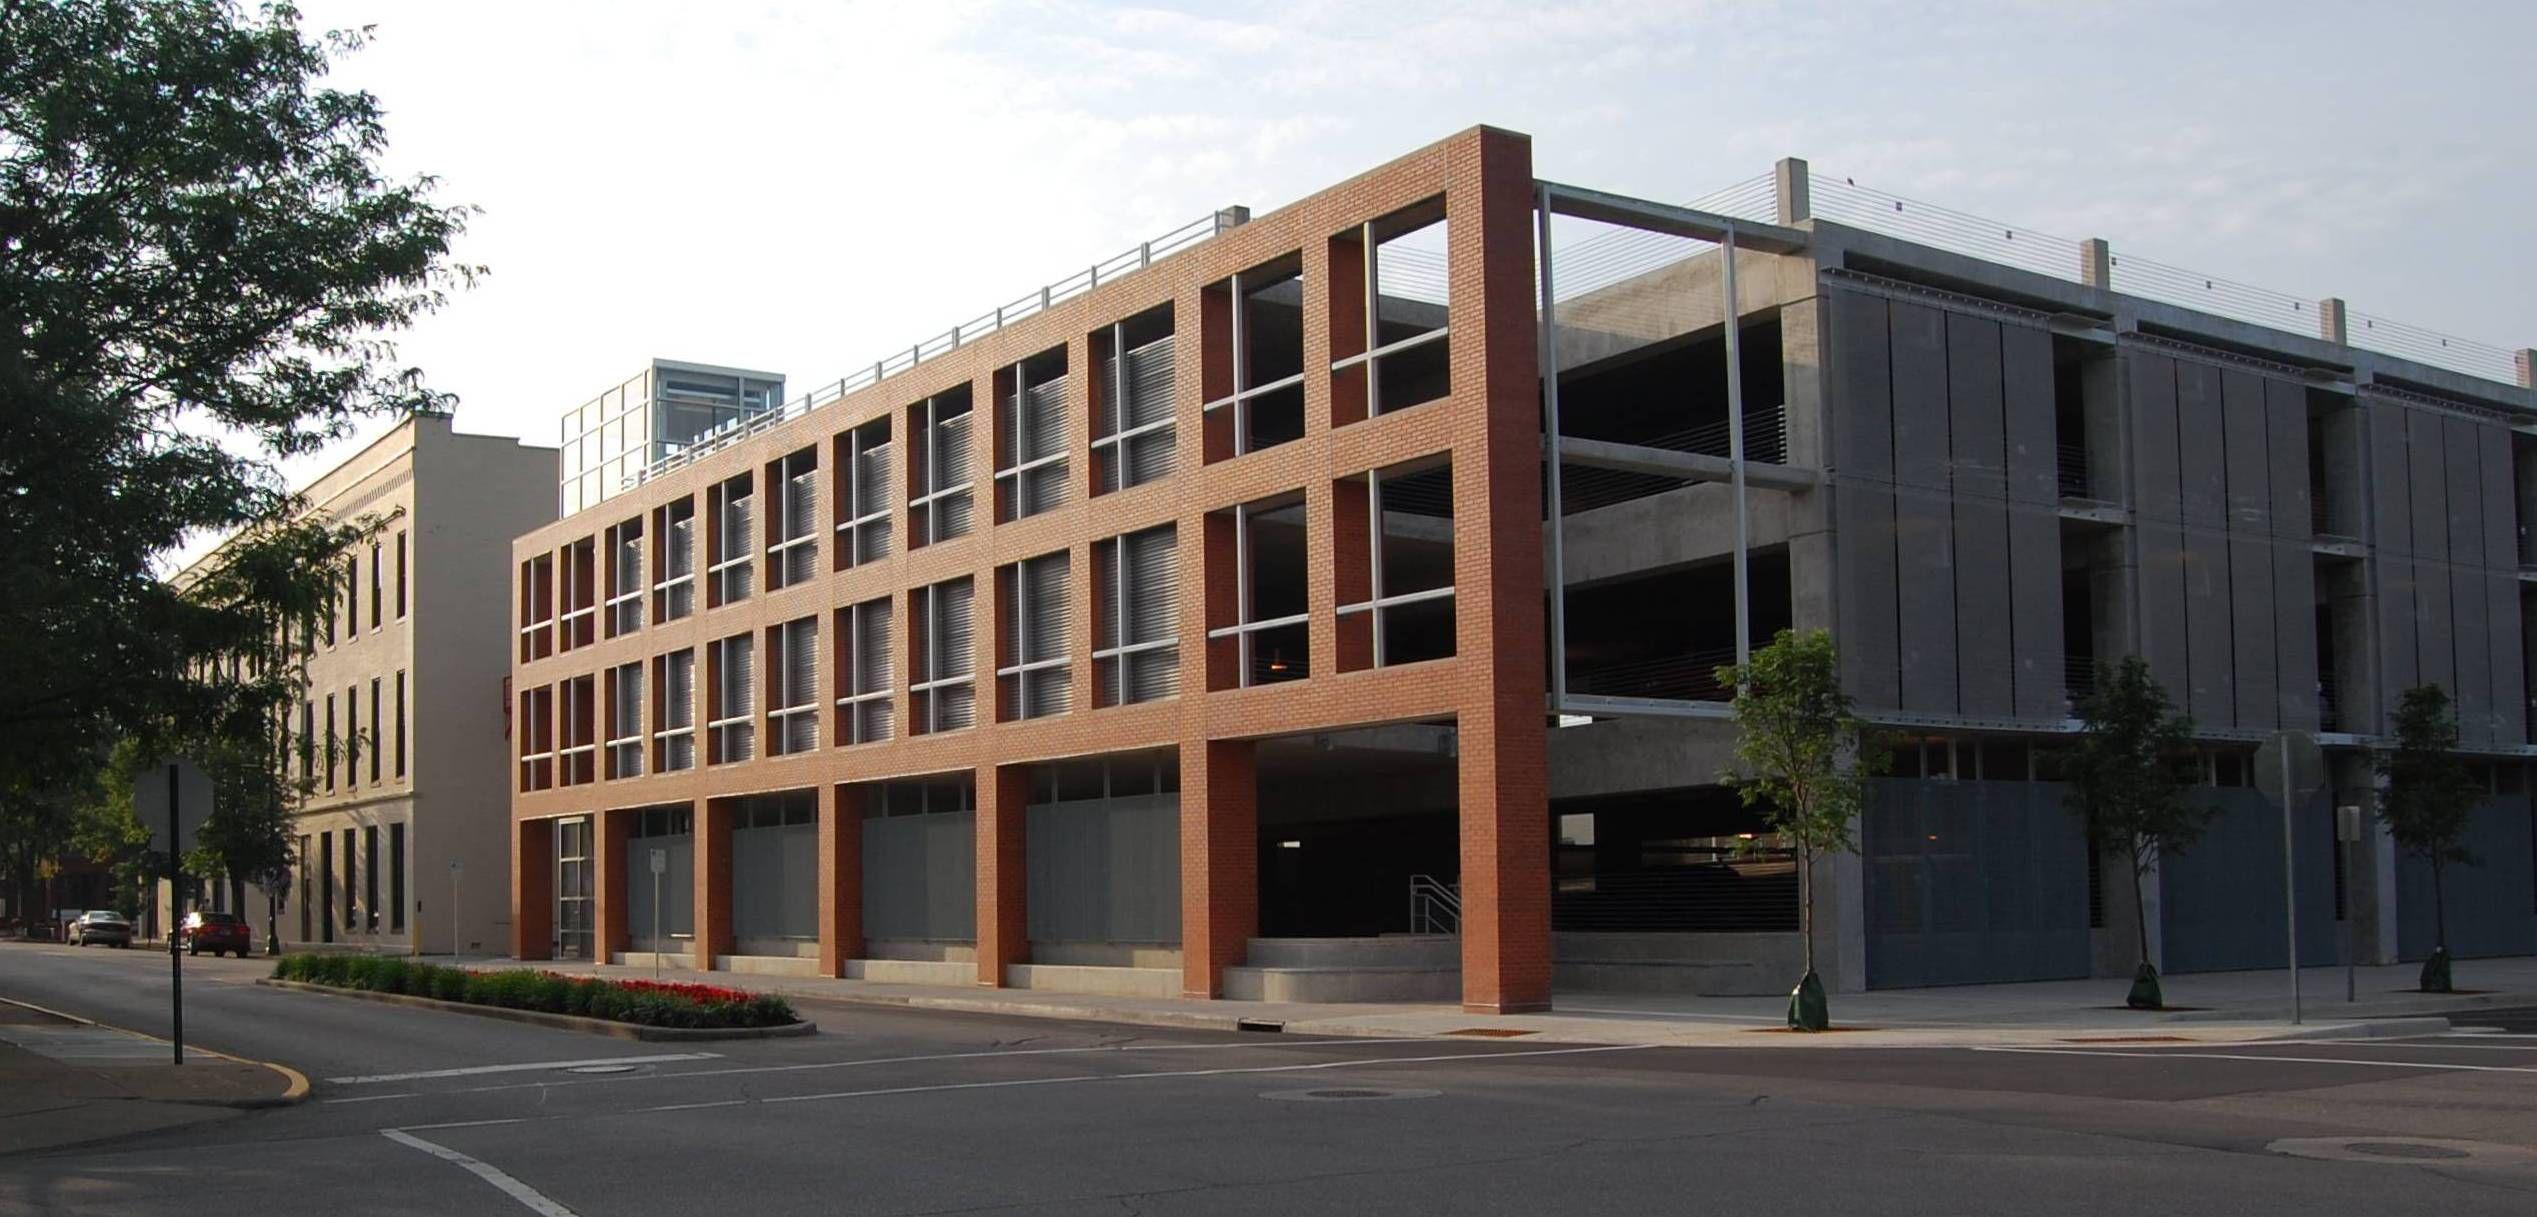 Parking Garage Columbus Indiana Jpg 2 537 1 217 Pixels Columbus Indiana Architecture Interior Design Gallery